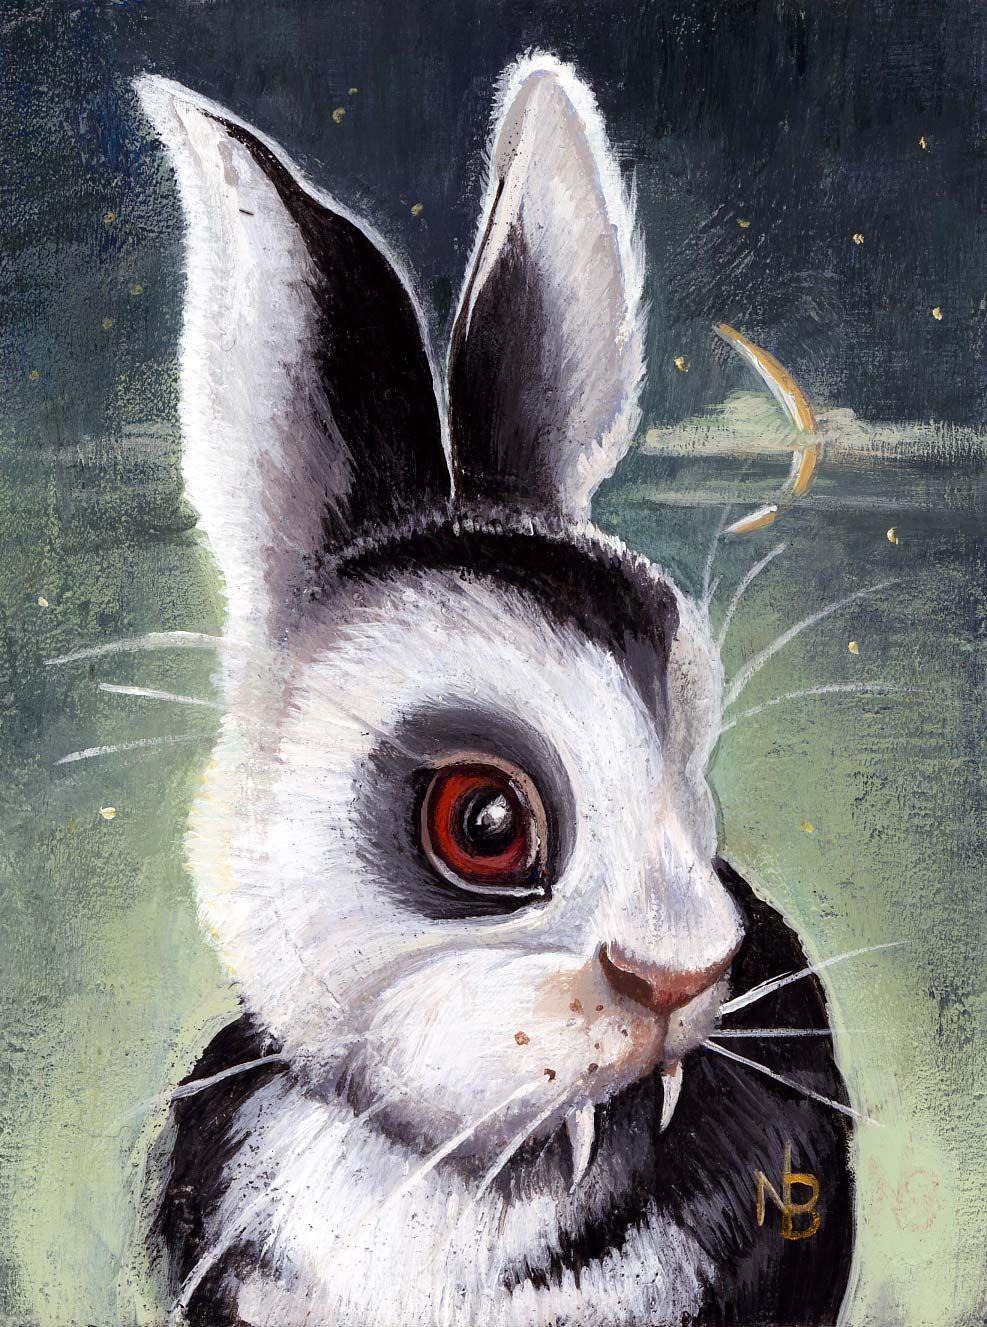 Uncategorized Nicole Bruckman S Blog Bunny Rabbit Art Bizarre Art Artist Inspiration White tomatoes reading bunnicula